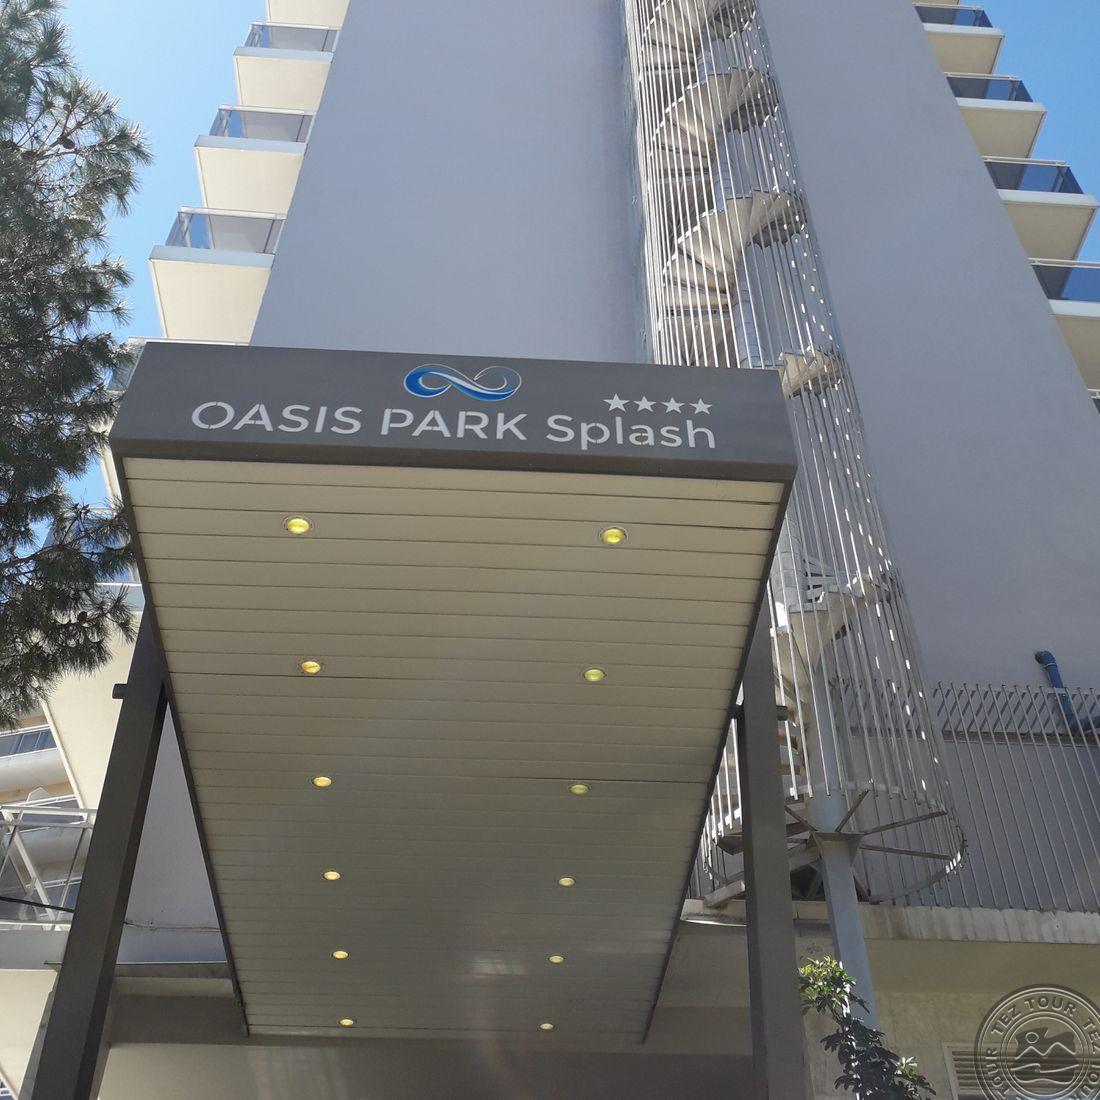 OASIS PARK SPLASH - Коста-де-Барселона - Маресме, Испания